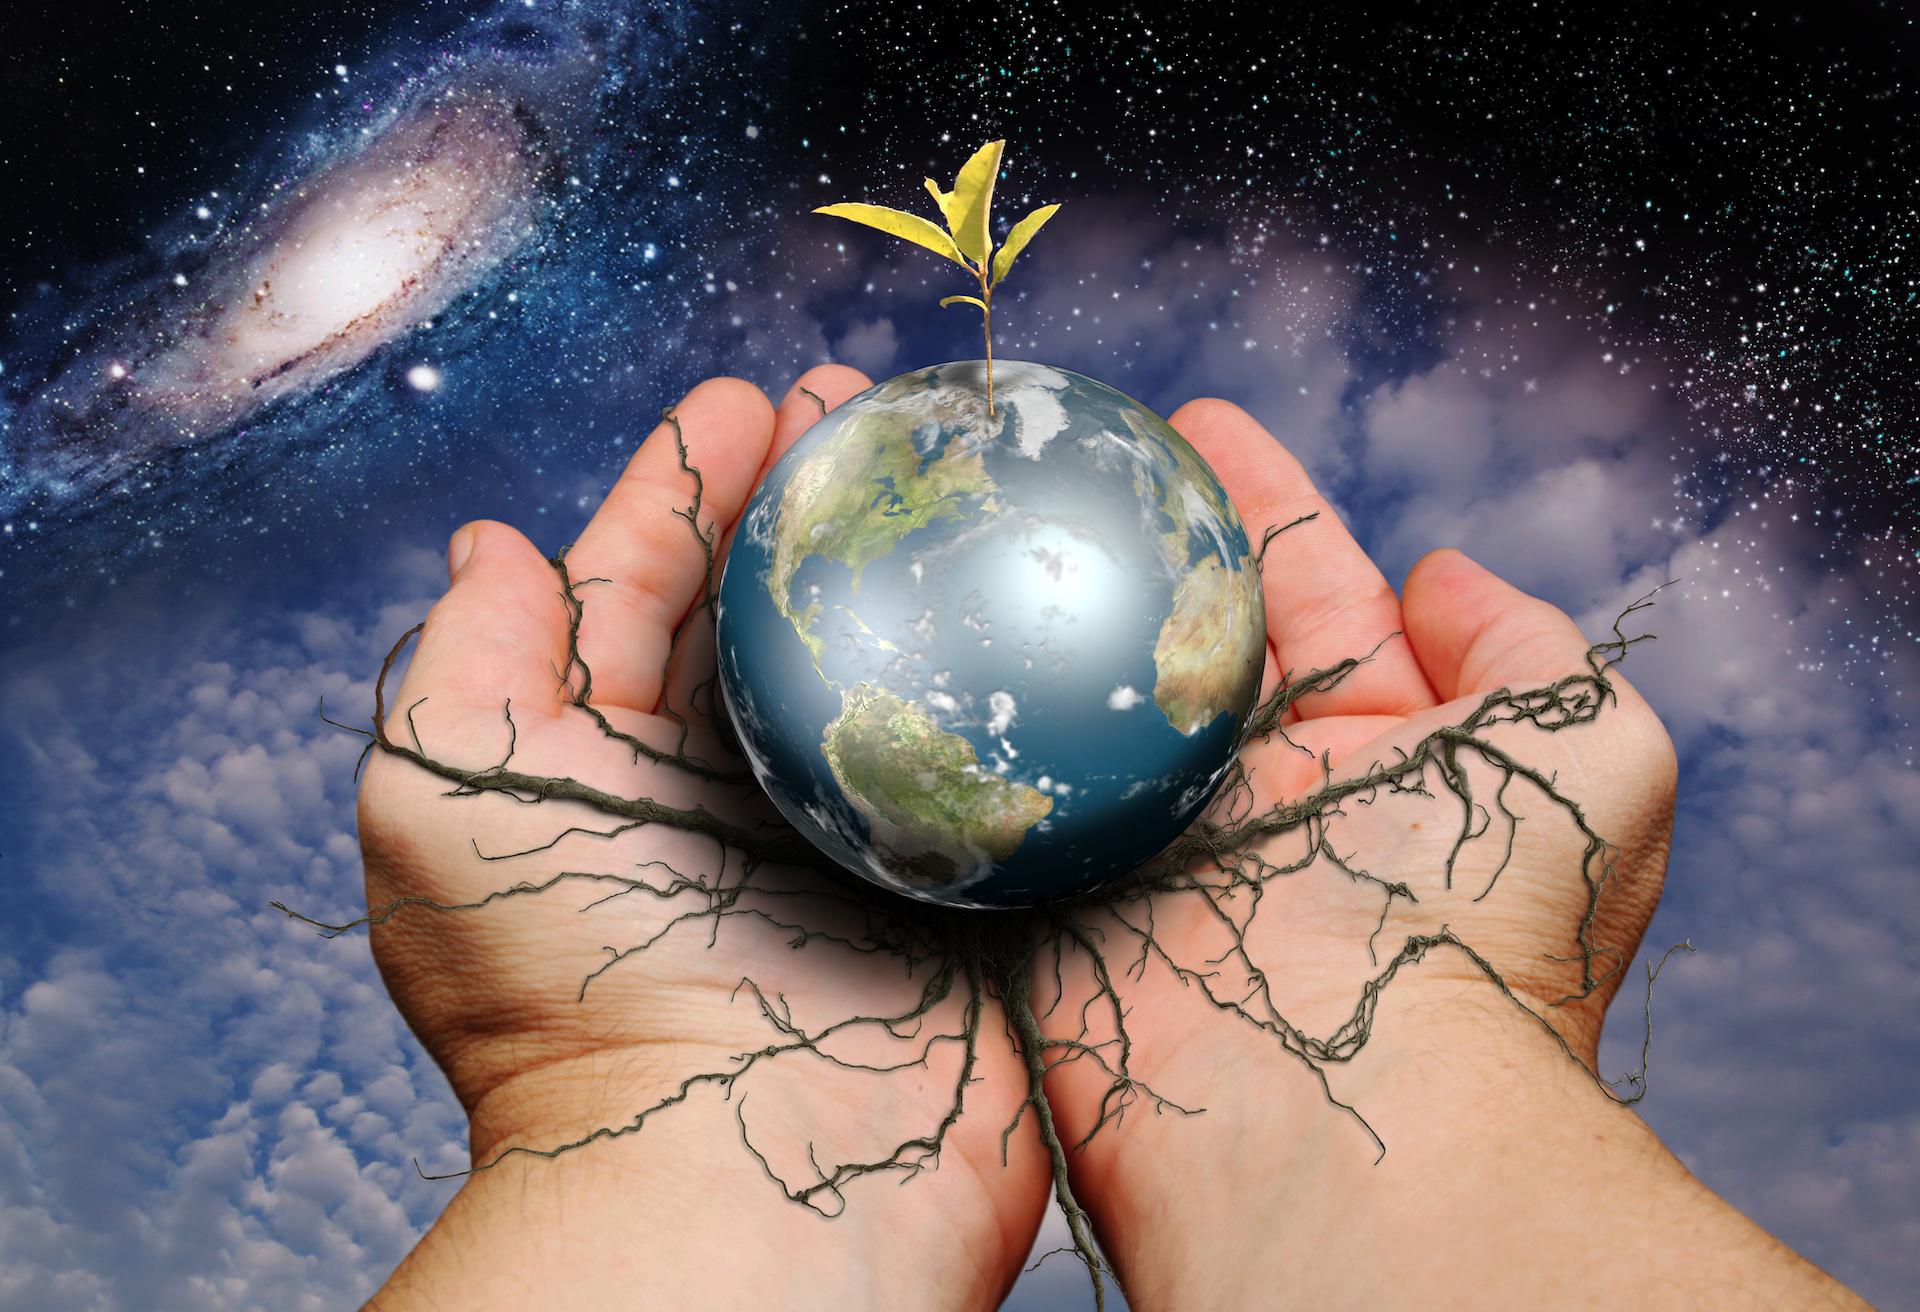 earth and cosmos in handJPG.JPG